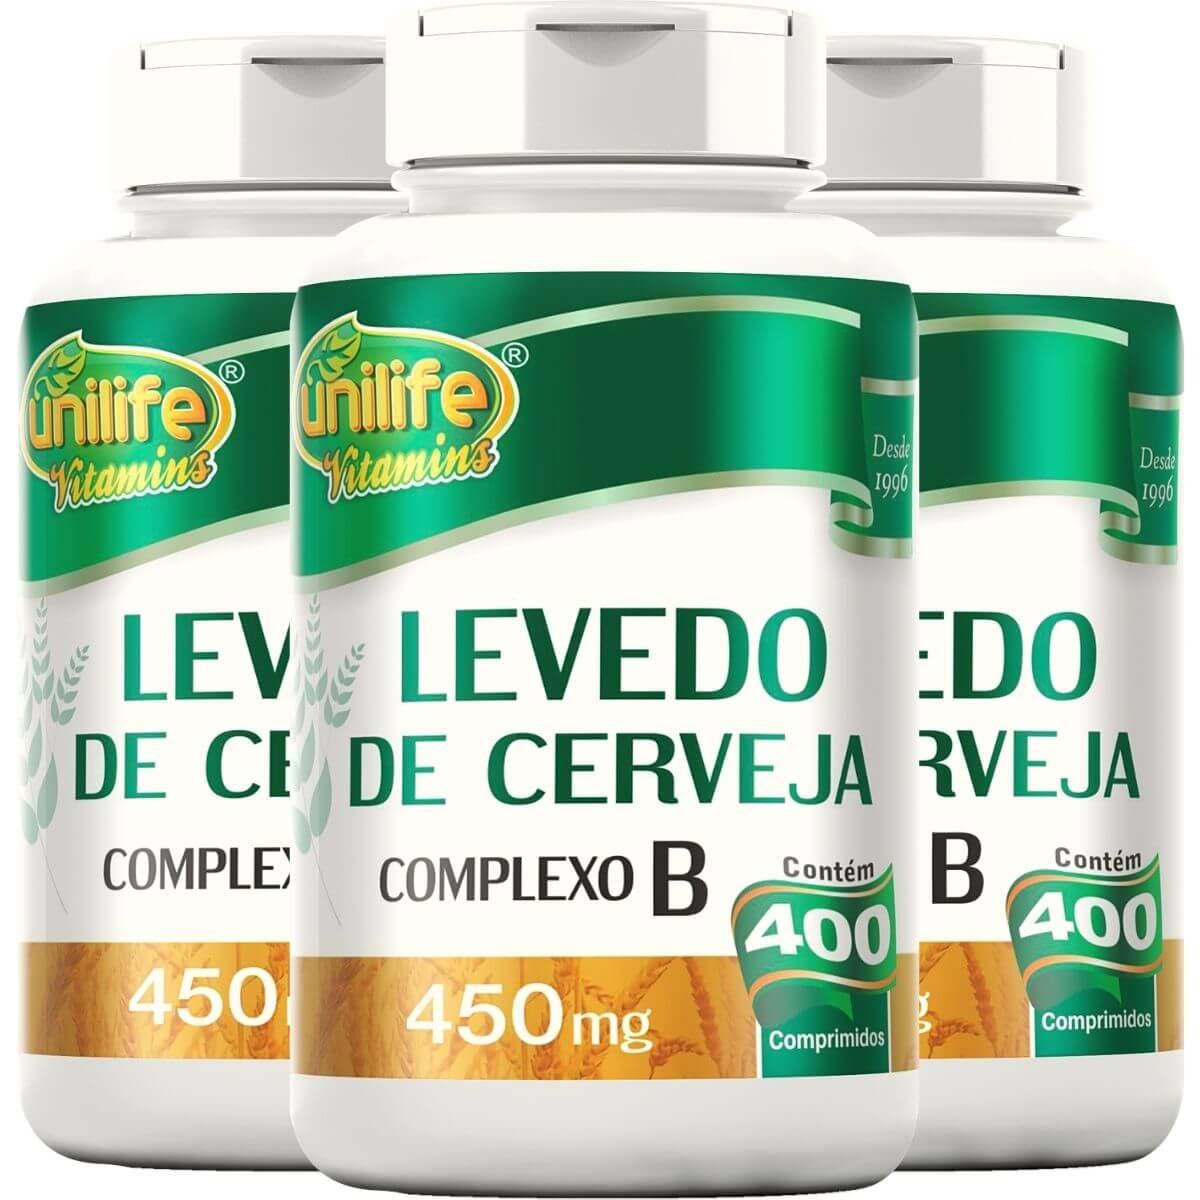 Kit 3 Levedo de Cerveja 400 Comprimidos 450mg - Unilife